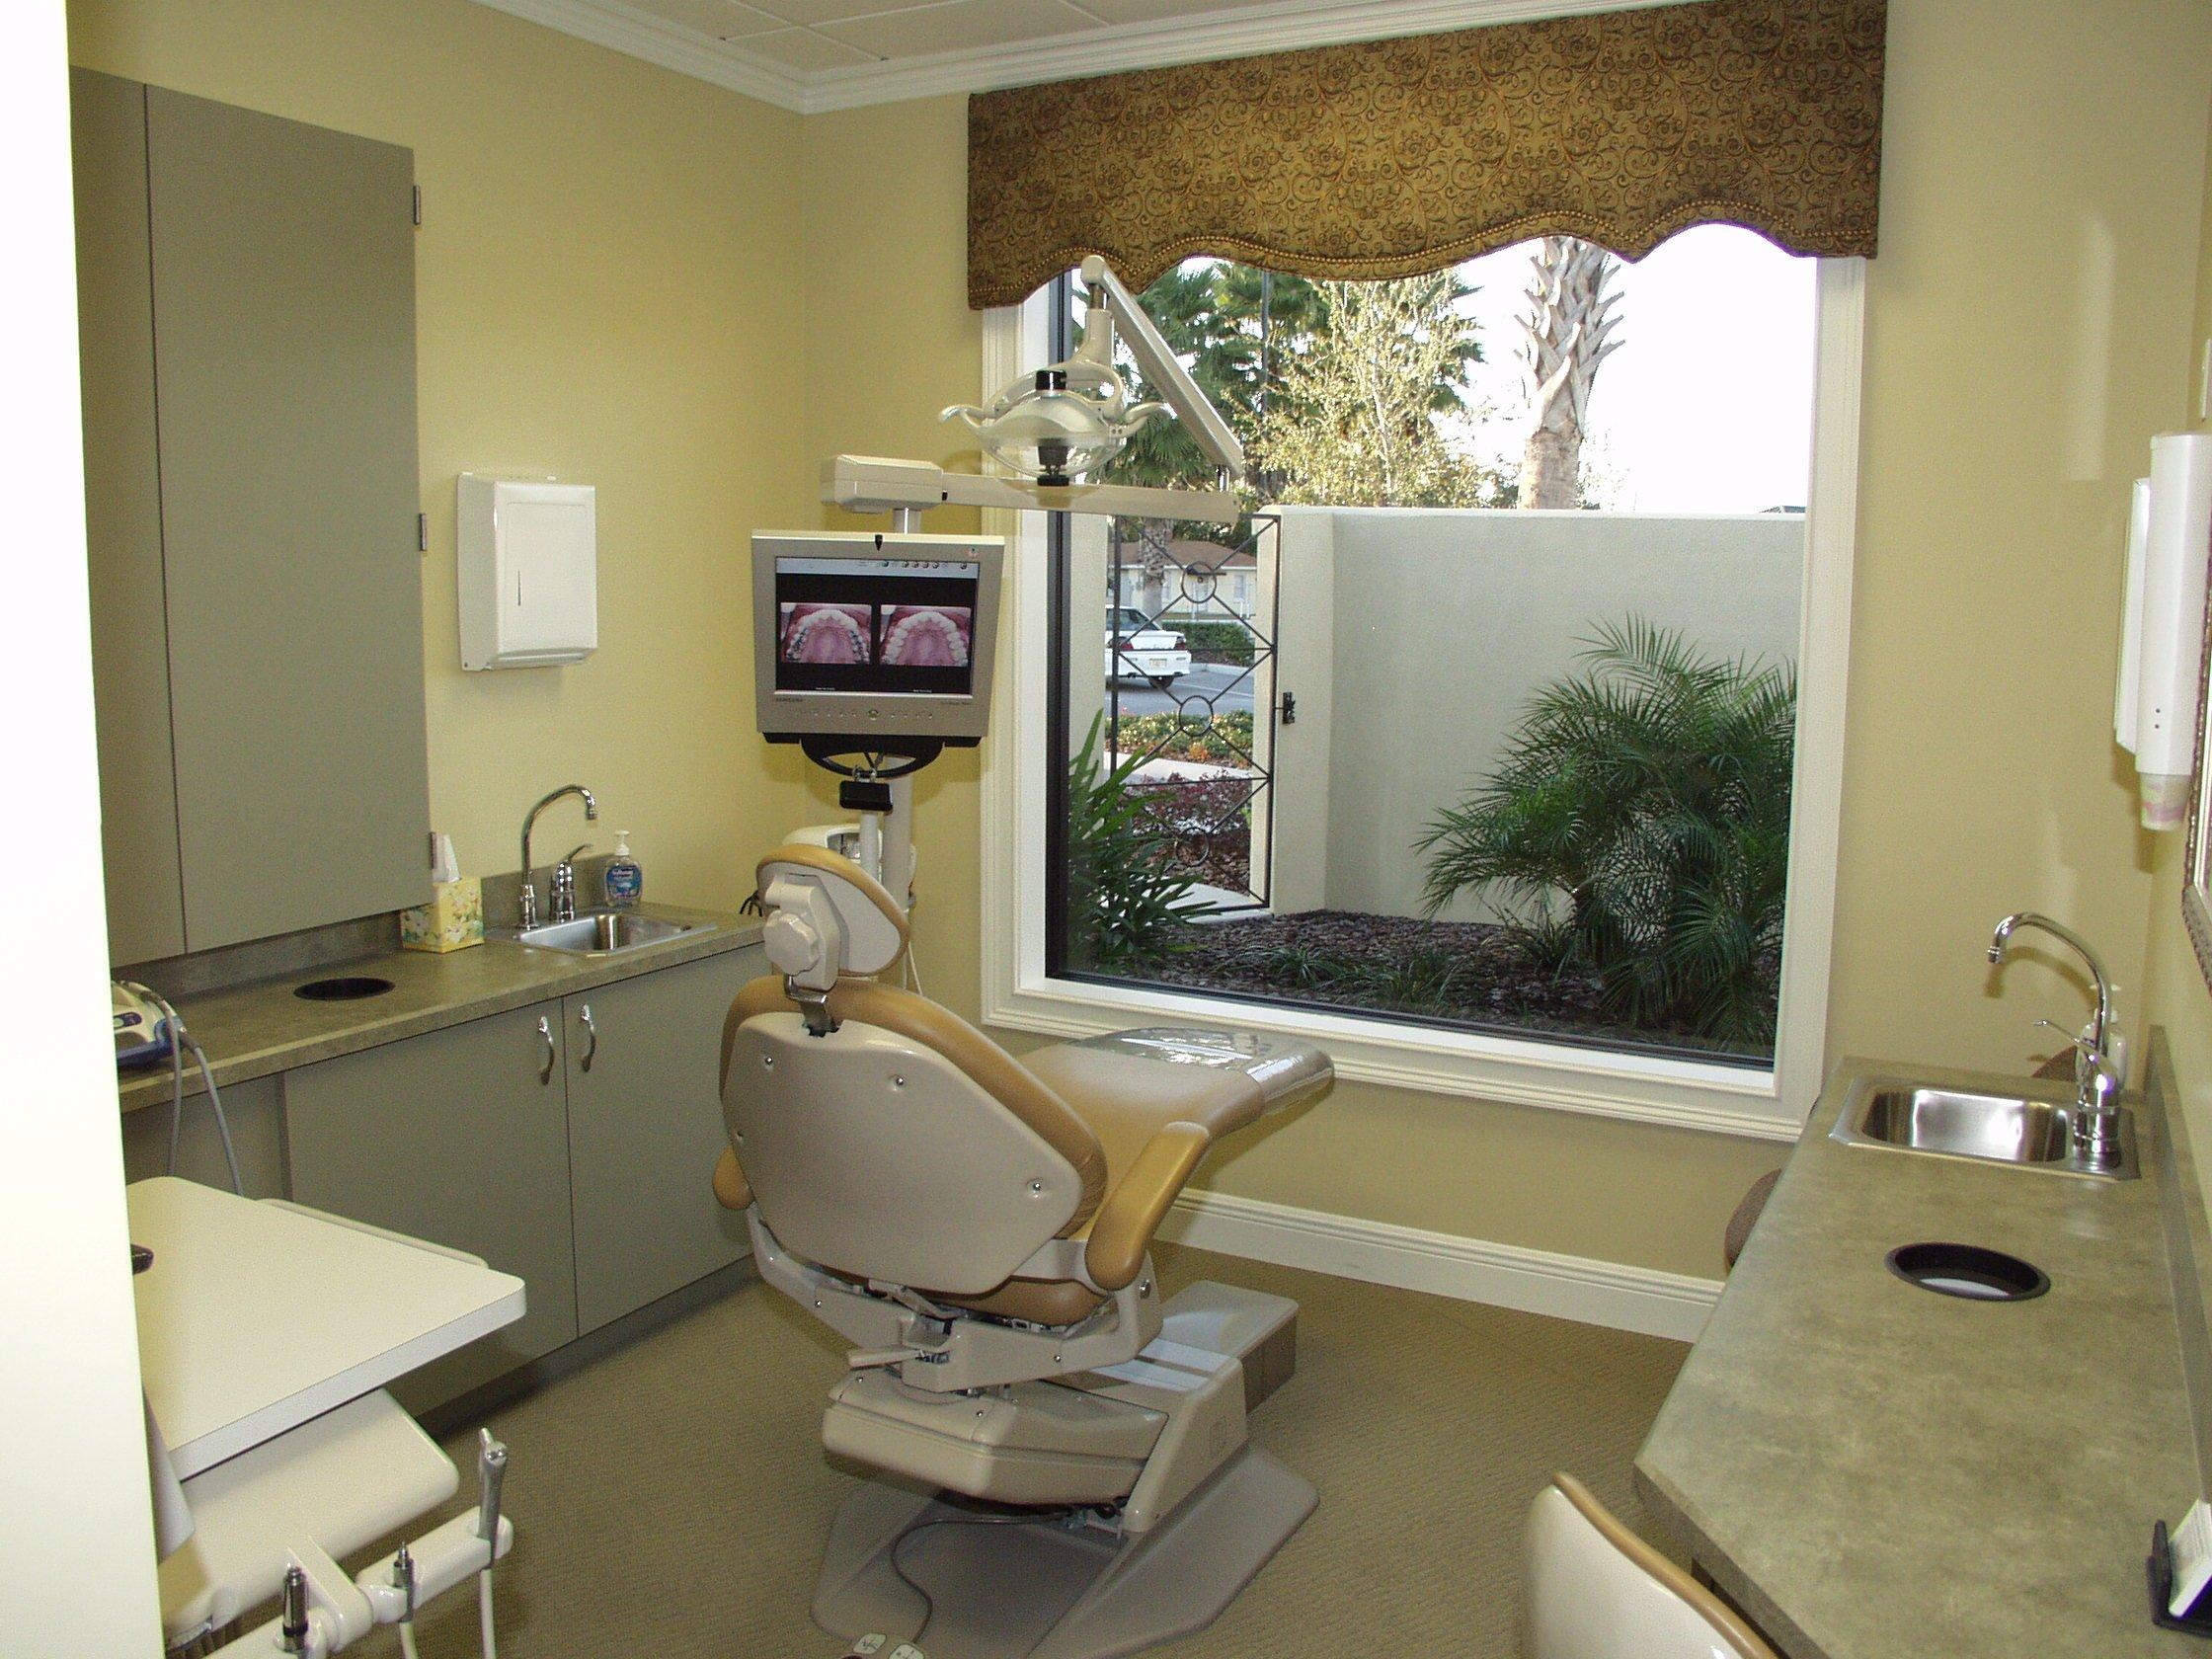 Dental Office Design Ideas image of dental office design ideas Dental Office Designs Dentists Hd Wallpaper Pictures Top Dental Office